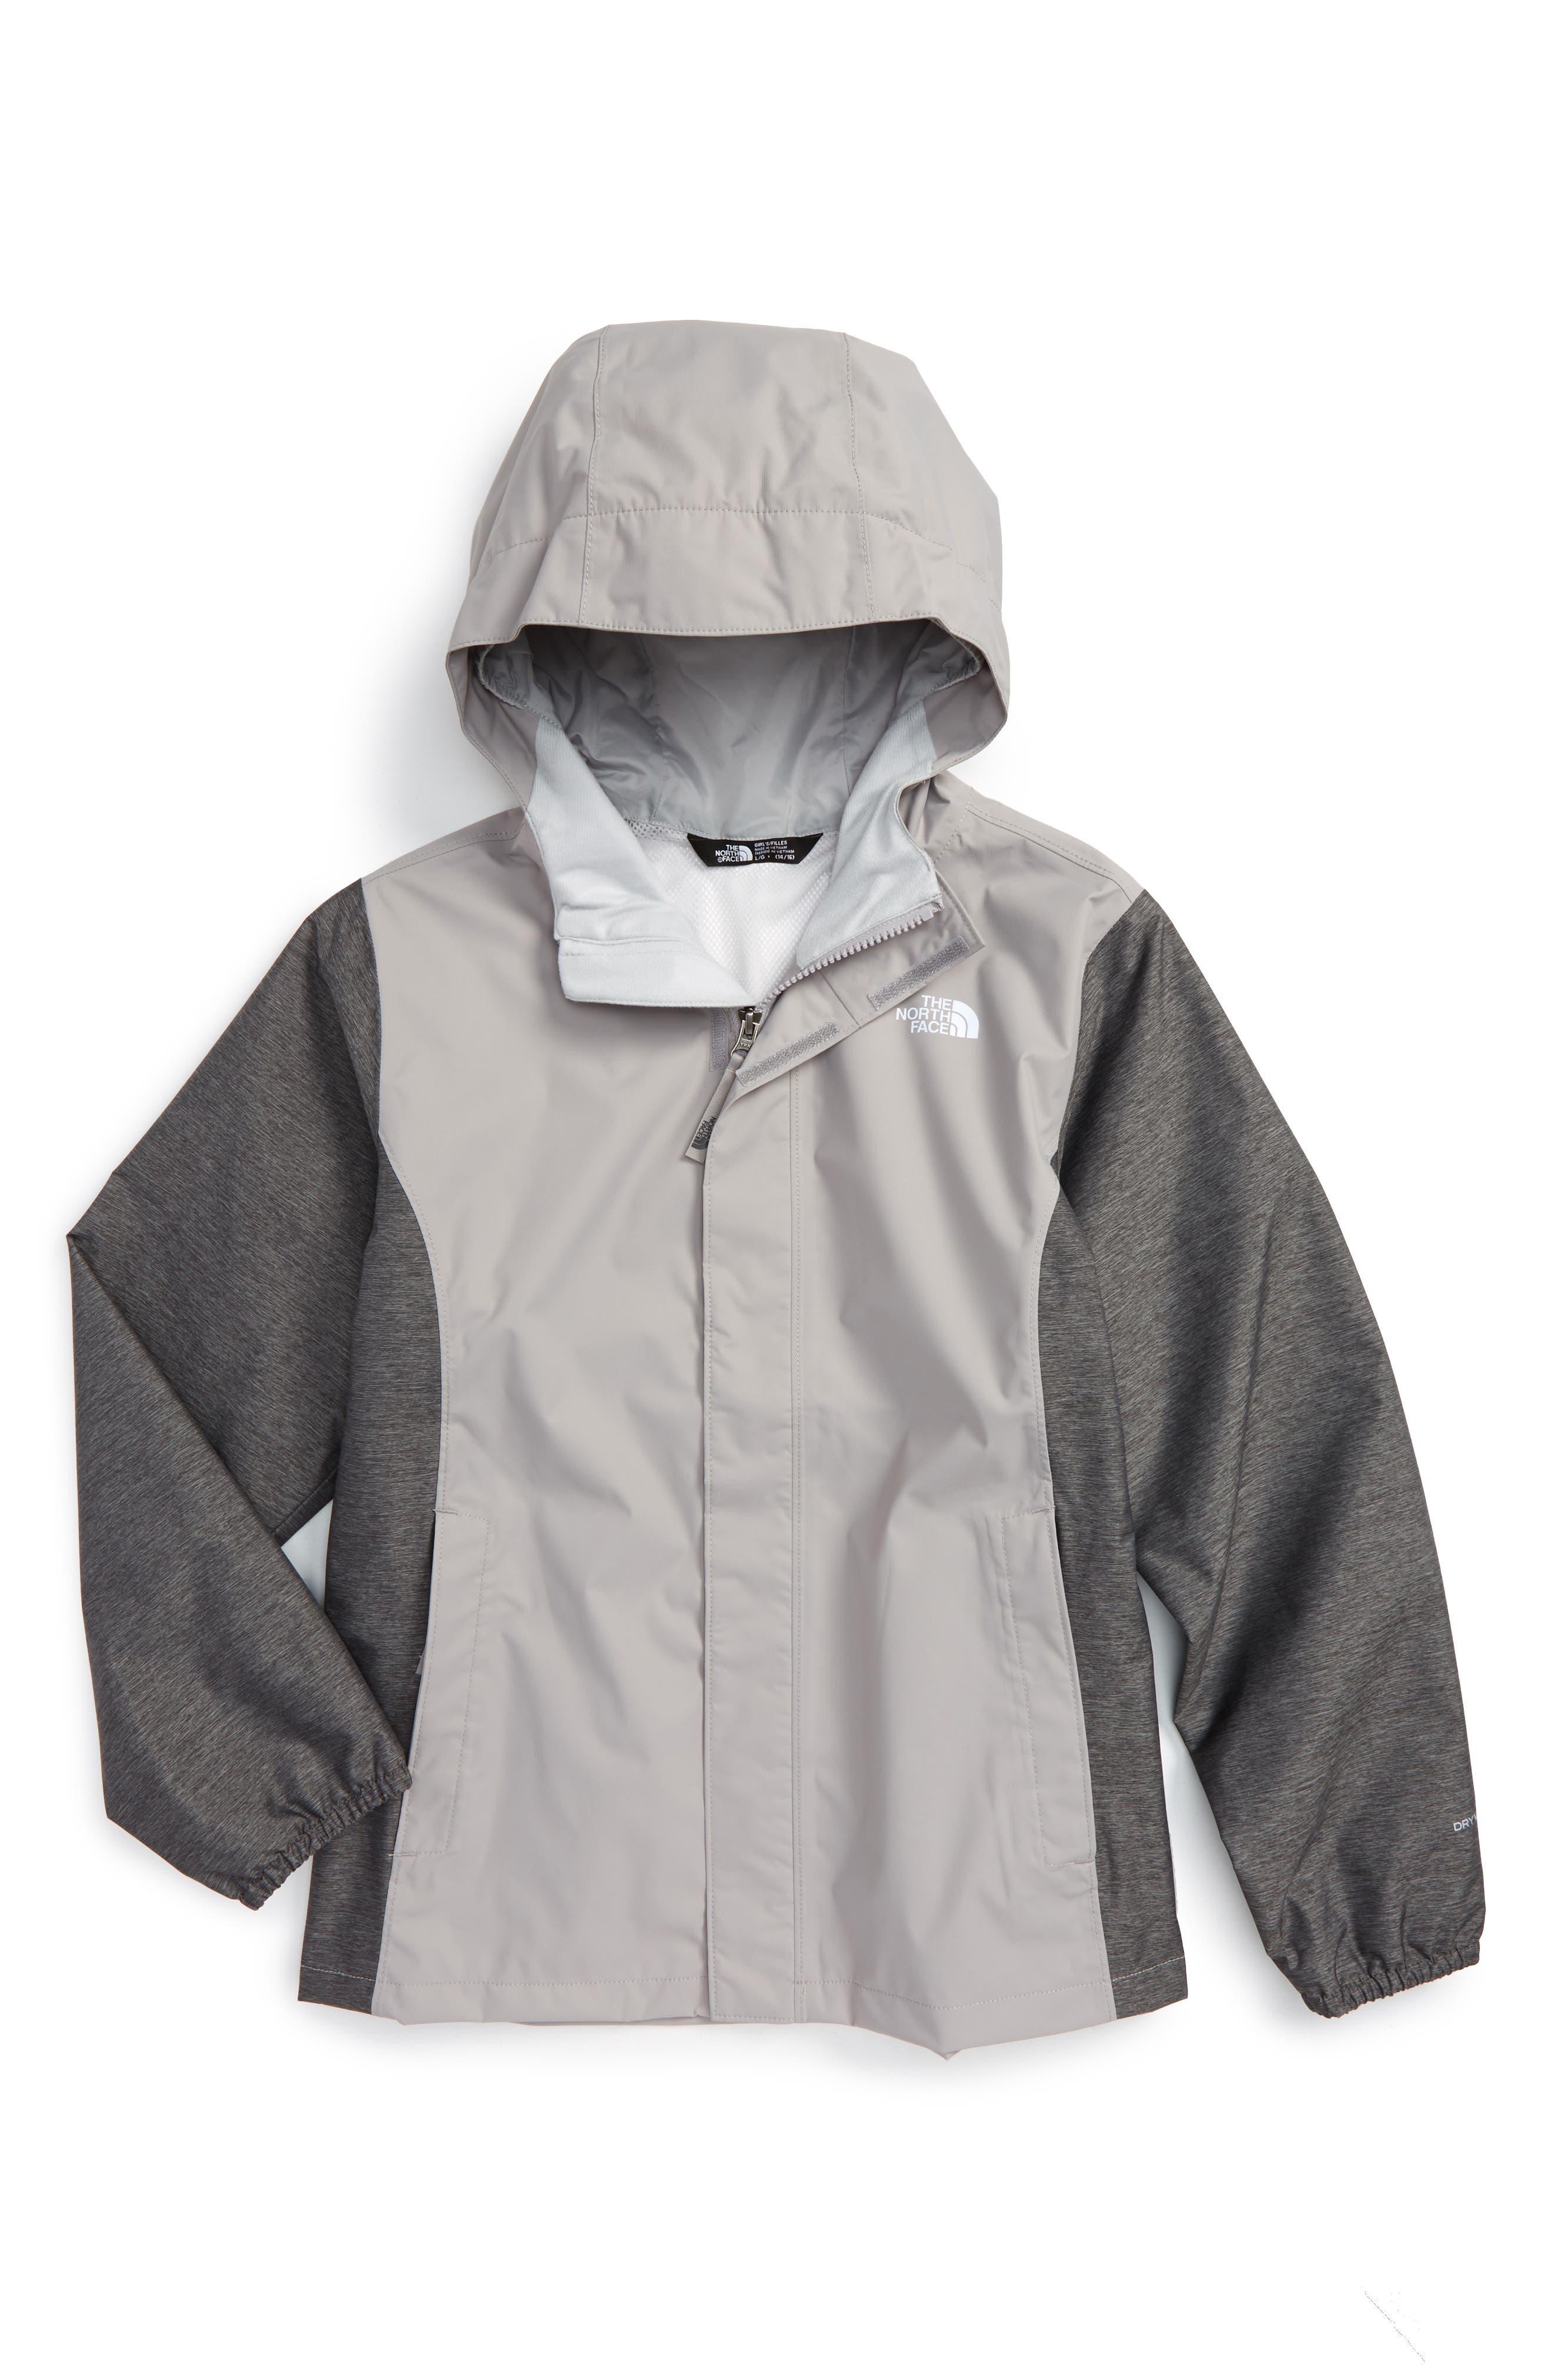 Main Image - The North Face 'Resolve' Reflective Waterproof Jacket (Big Girls)